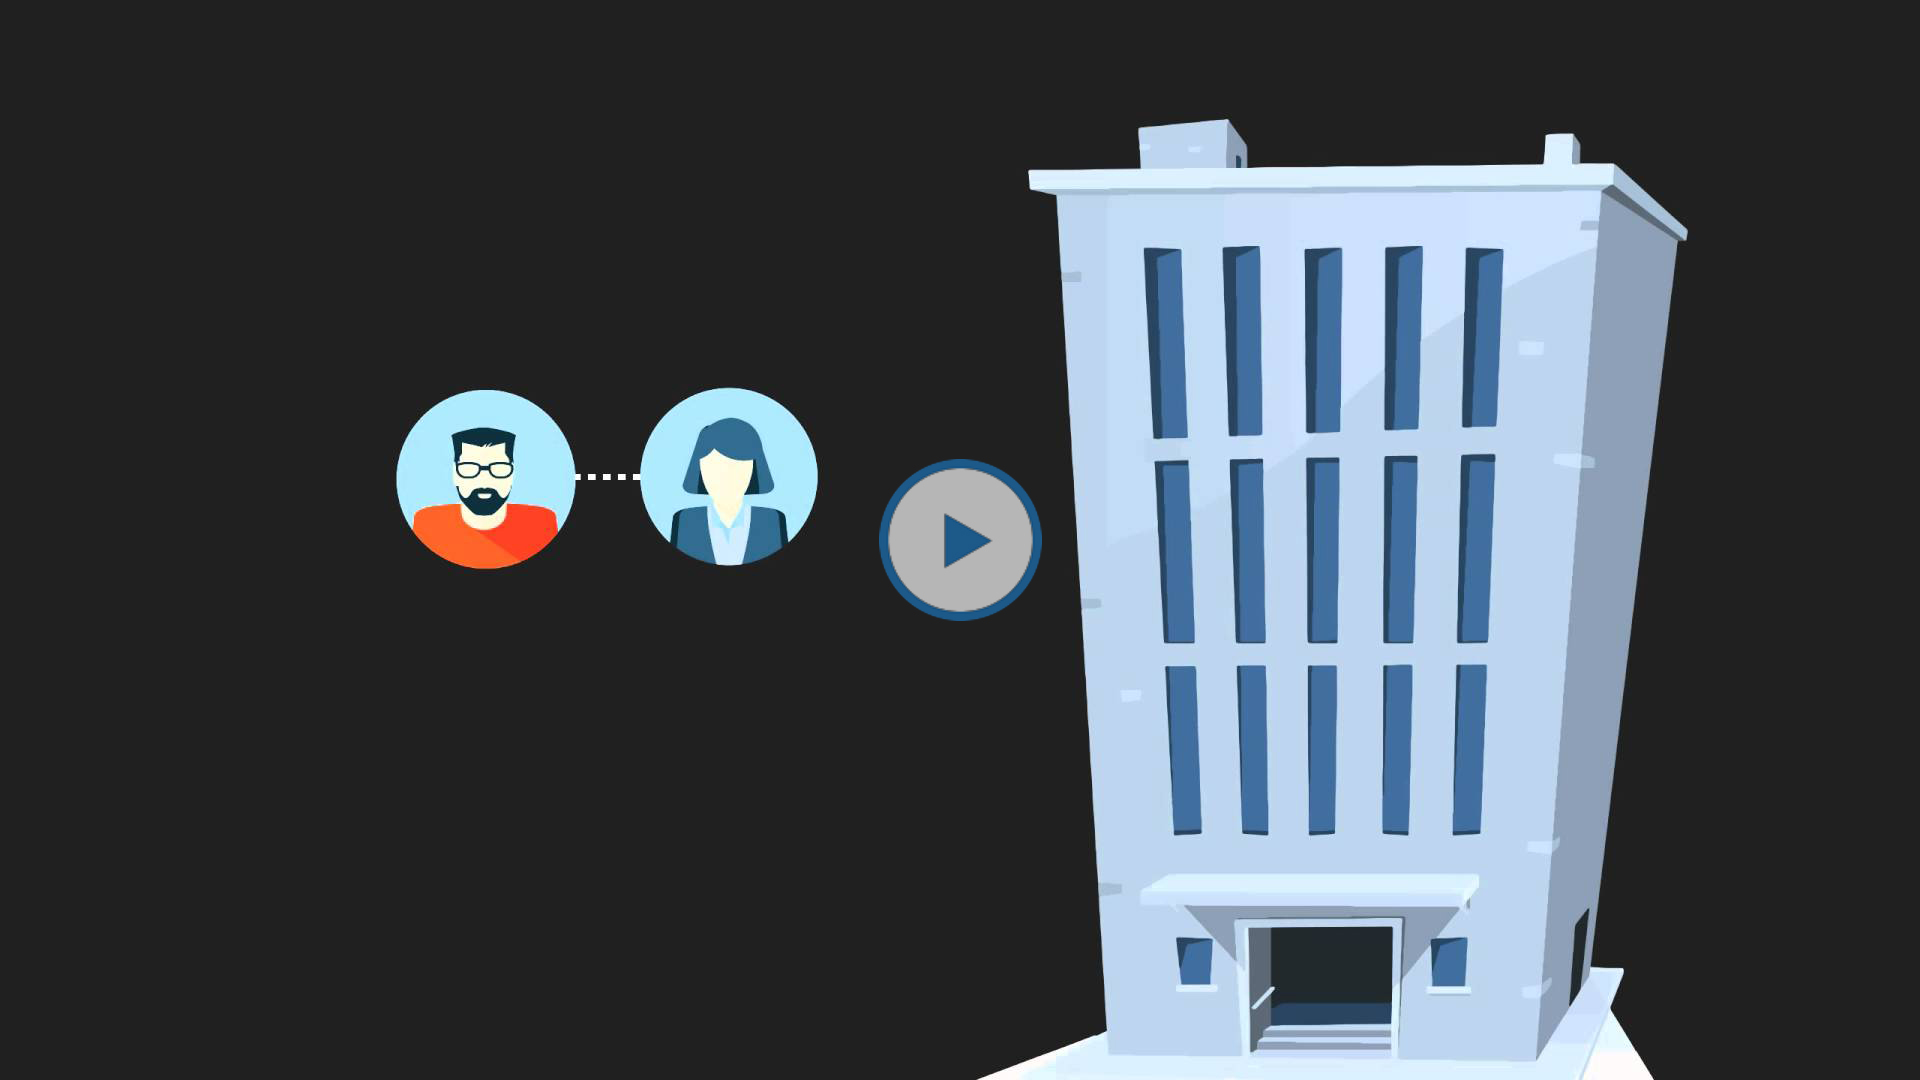 Newzsocial - Social Media Marketing for Enterprise